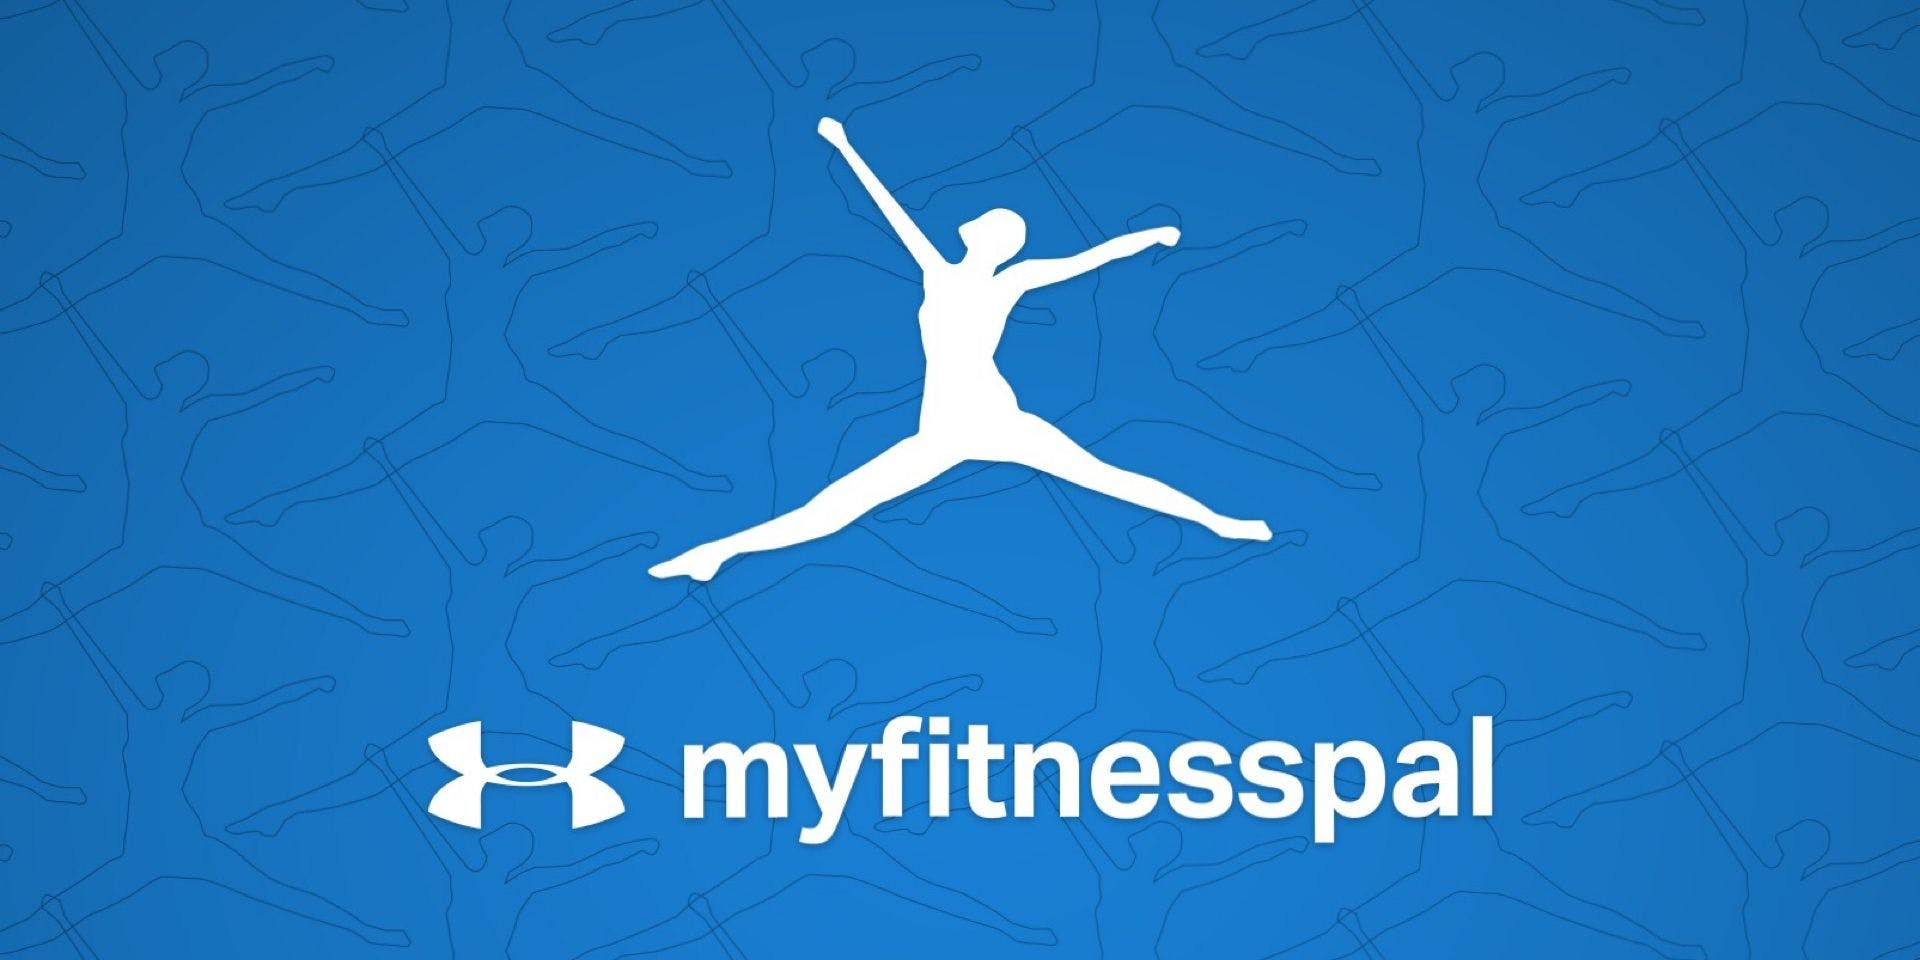 myfitnesspal app logo